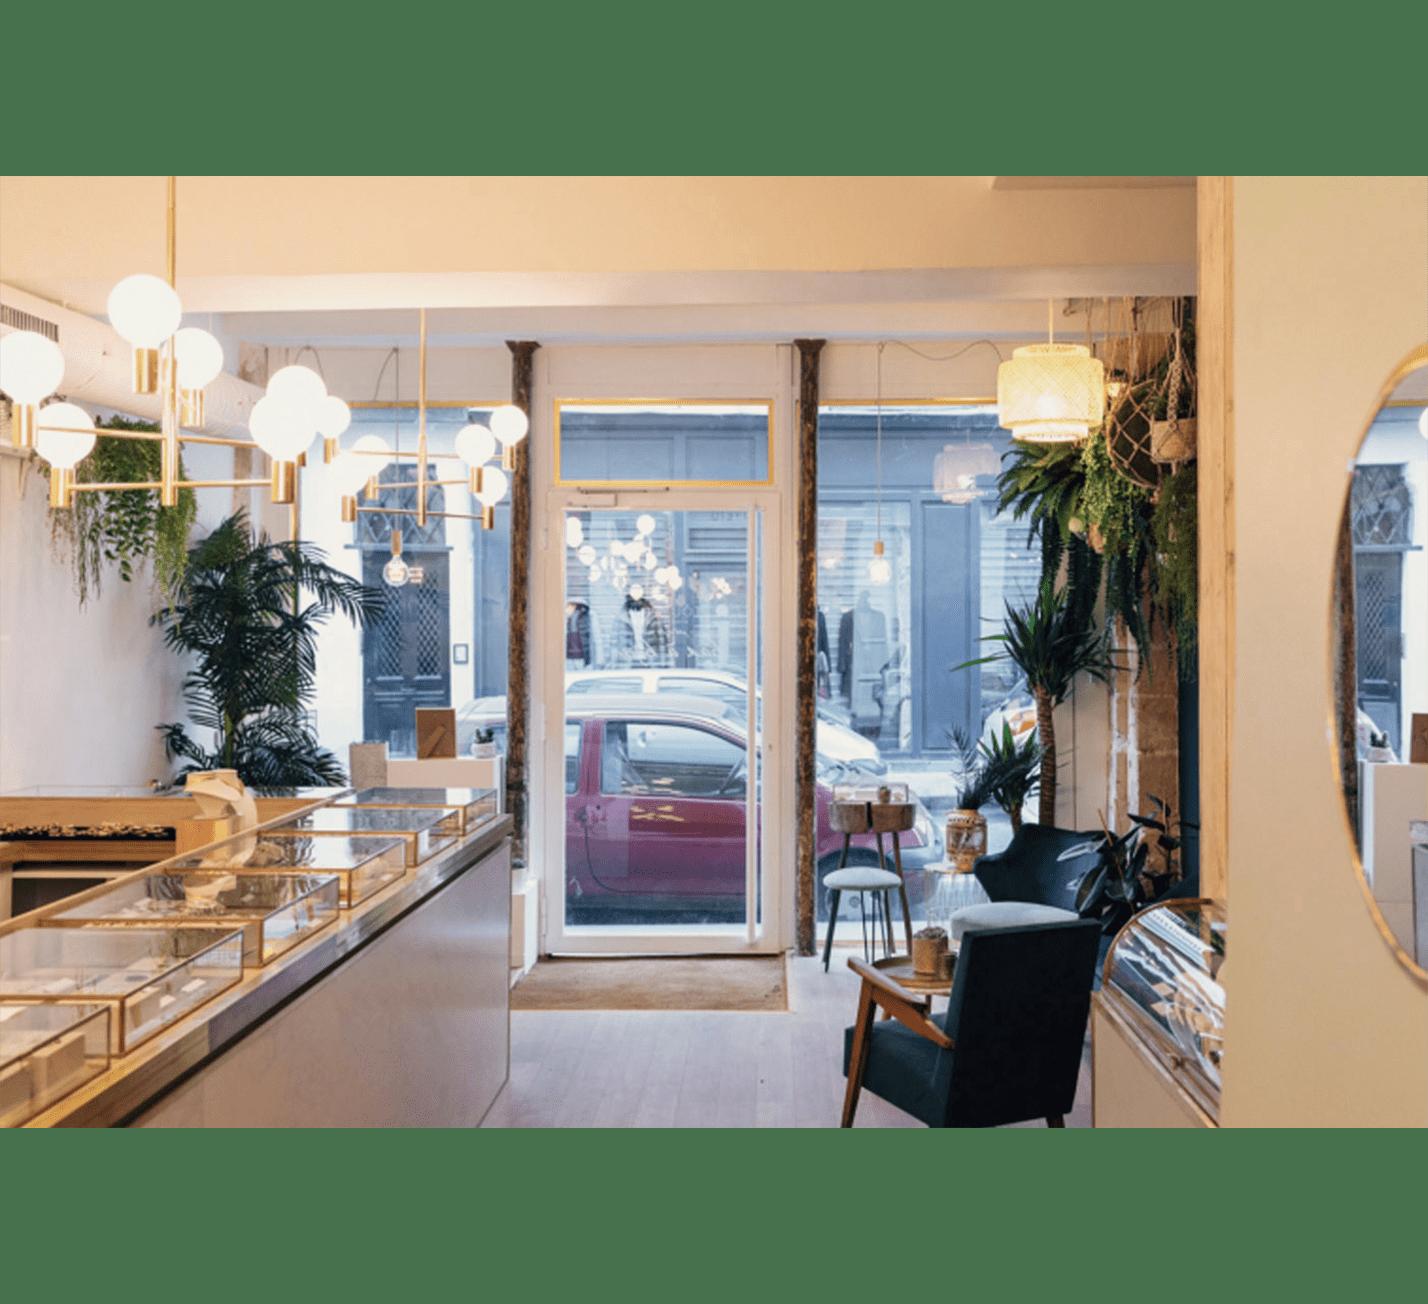 Projet-Lou-Yetu-Atelier-Steve-Pauline-Borgia-Architecture-interieur-02-min